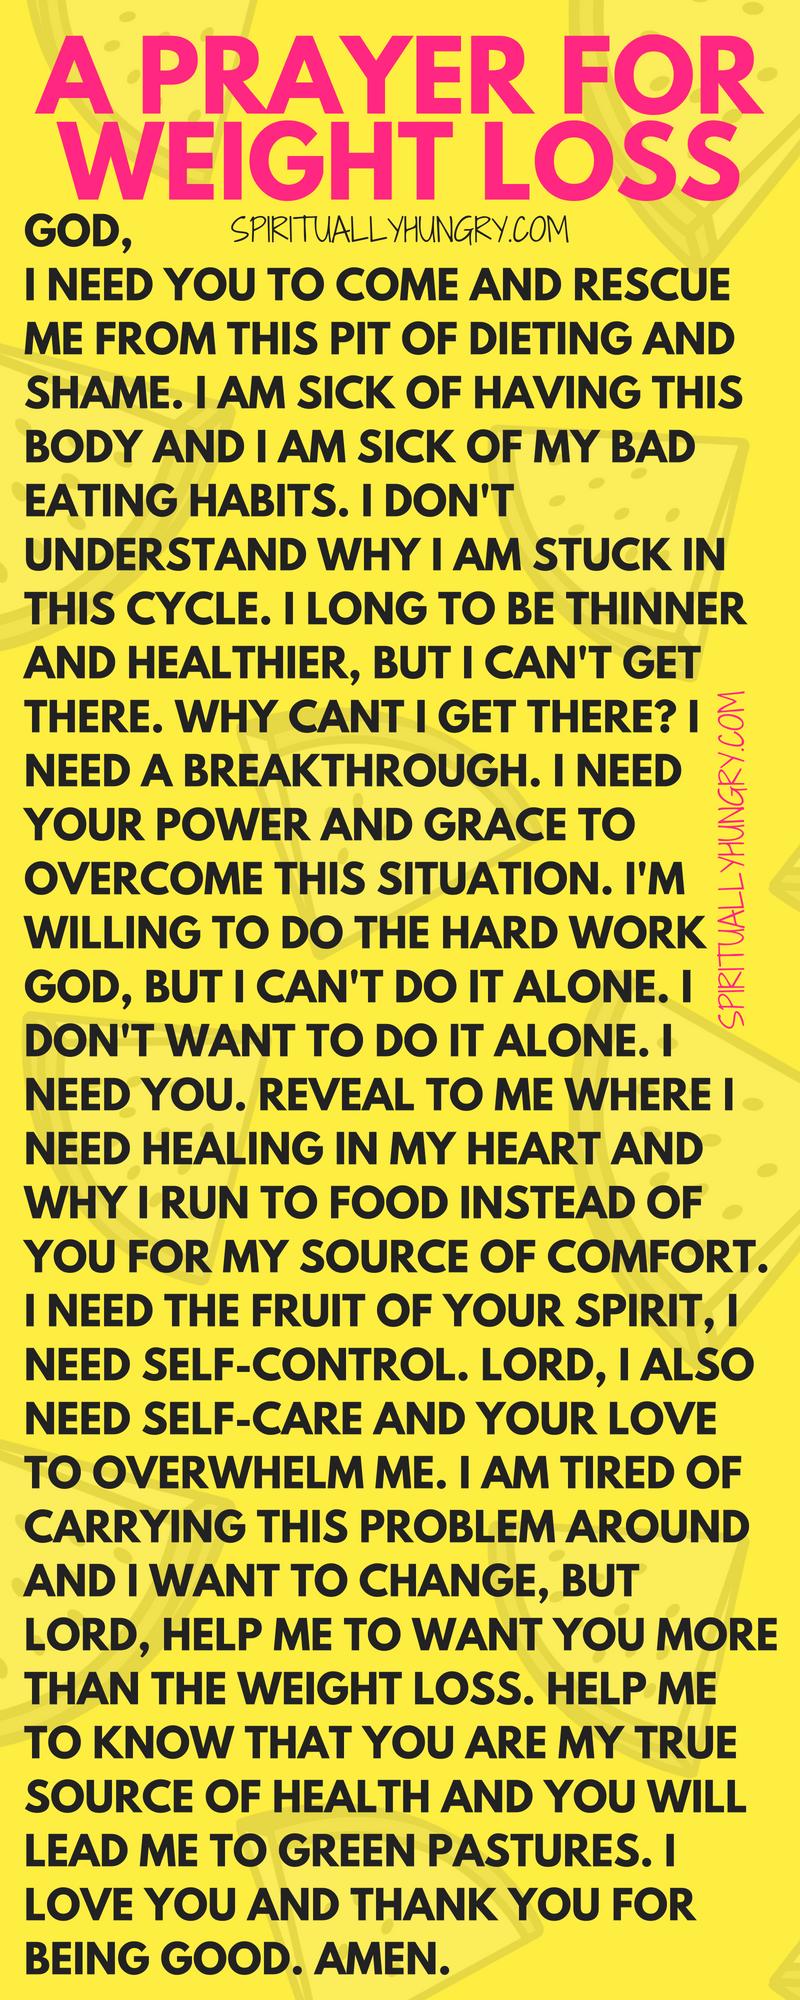 A Weight Loss Prayer - Spiritually Hungry